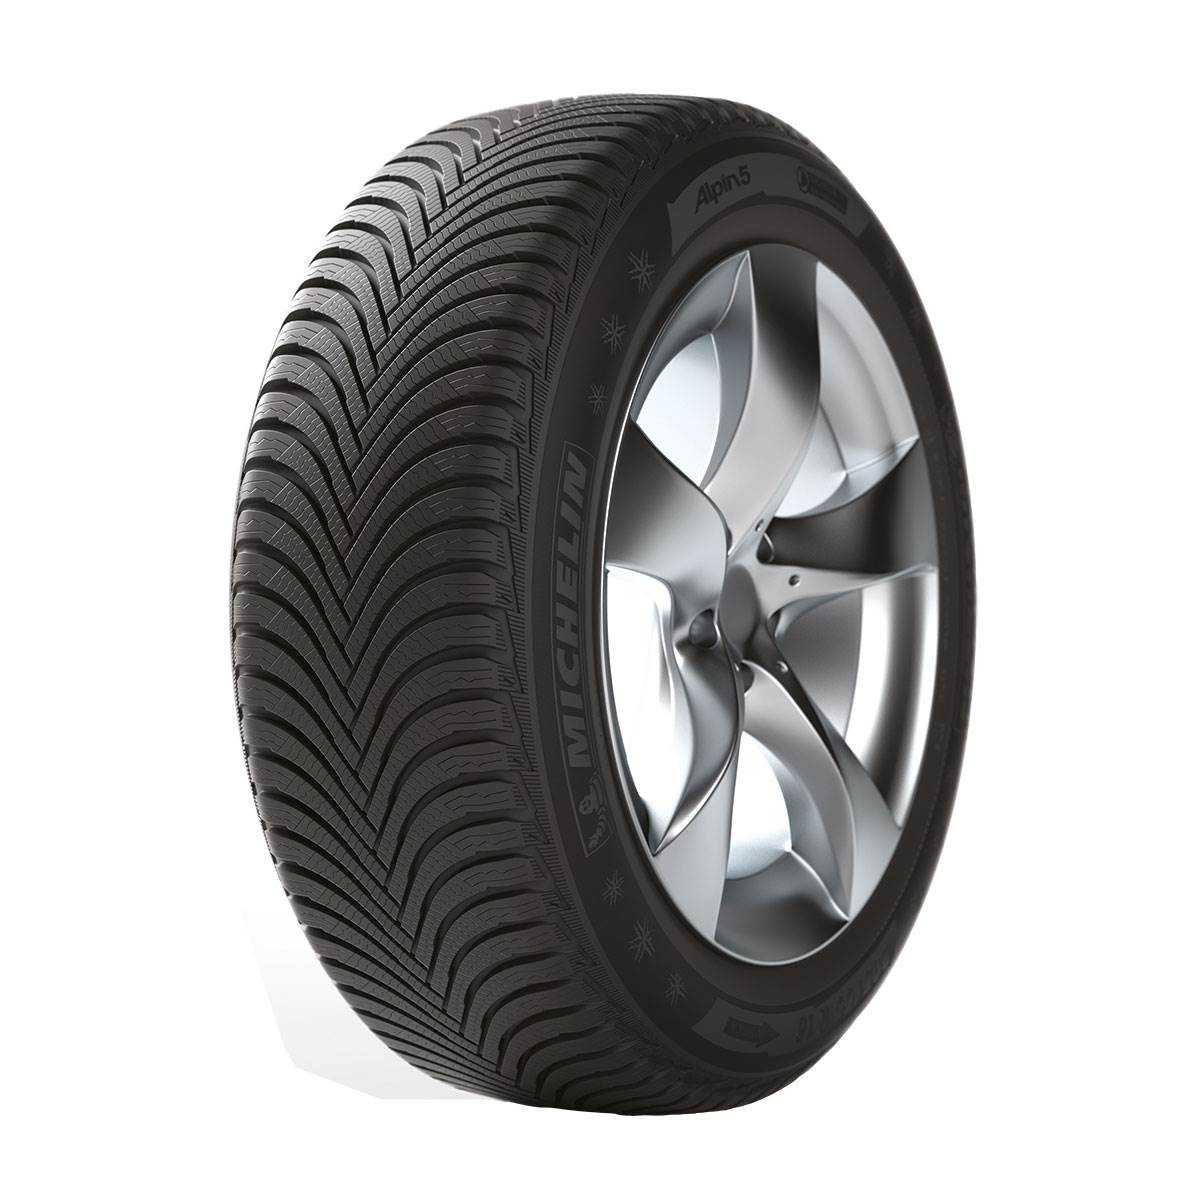 Pneu Hiver Michelin 225/55R16 99V Alpin A5 XL